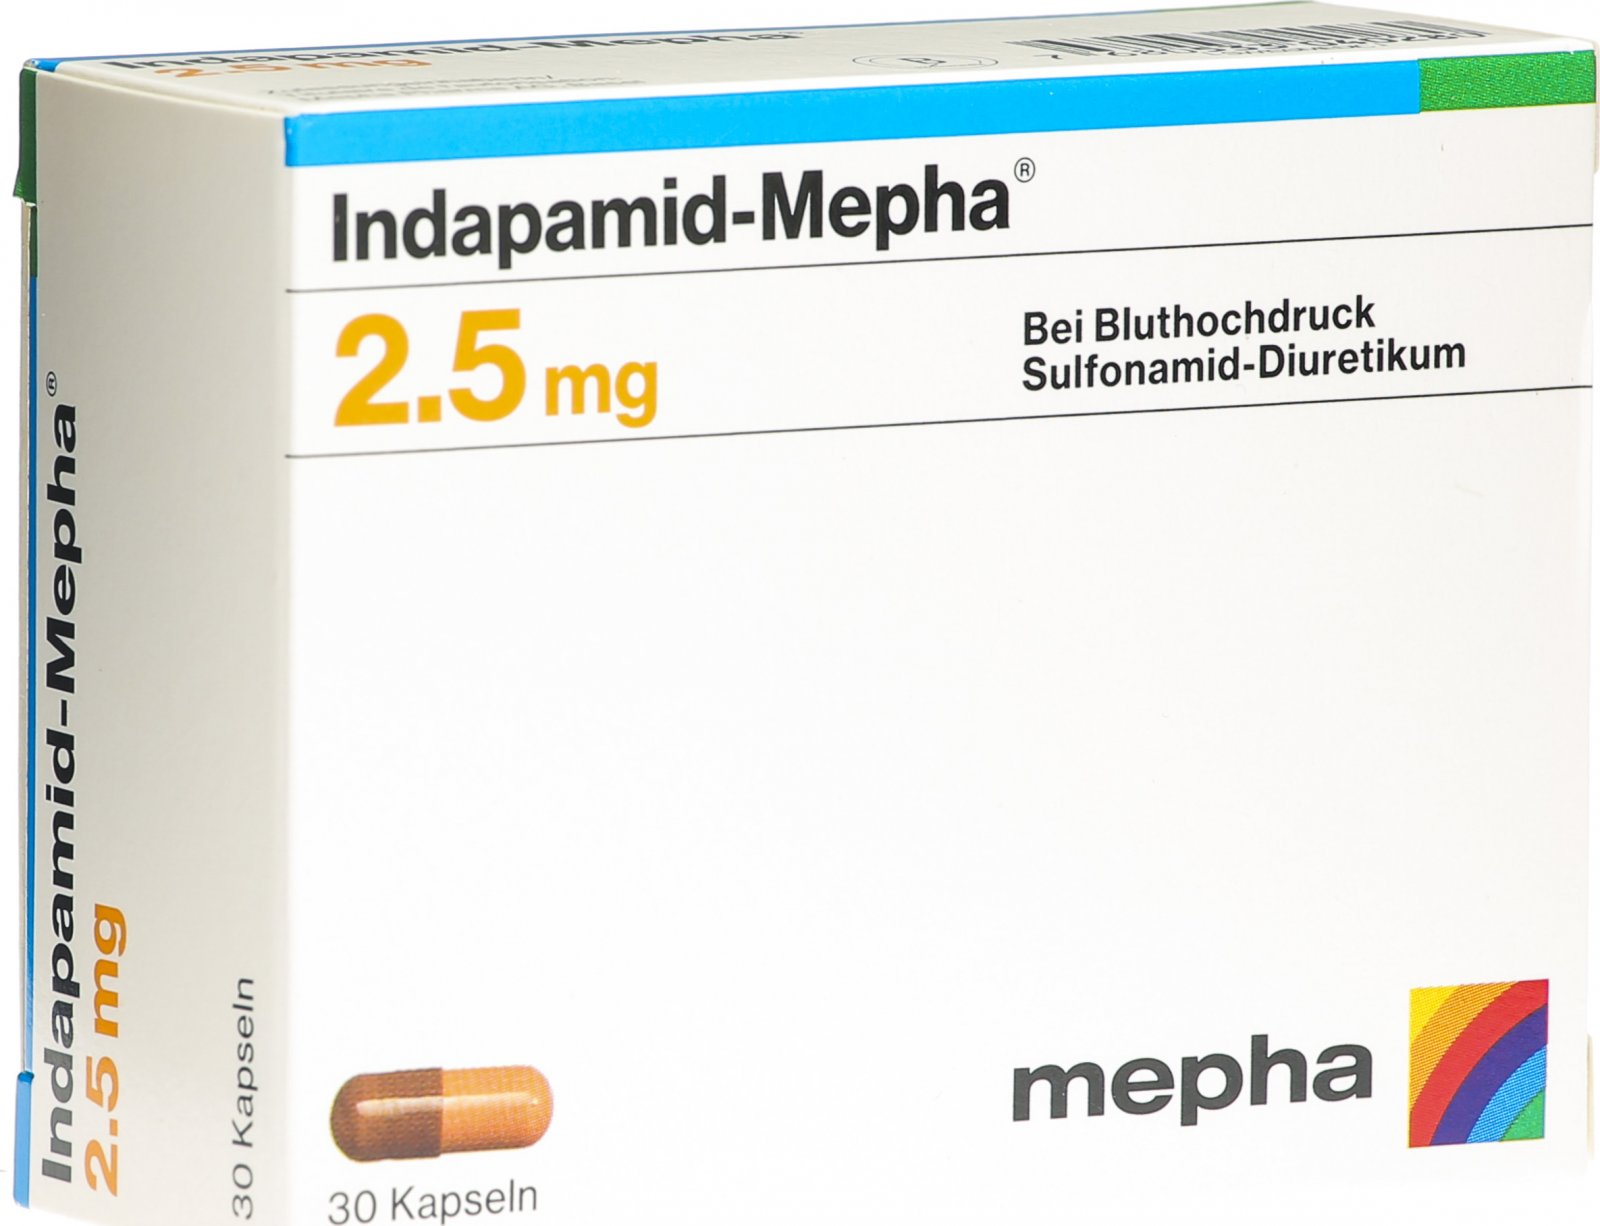 Indapamid Mepha Kapseln 20 Stück in der Adler Apotheke